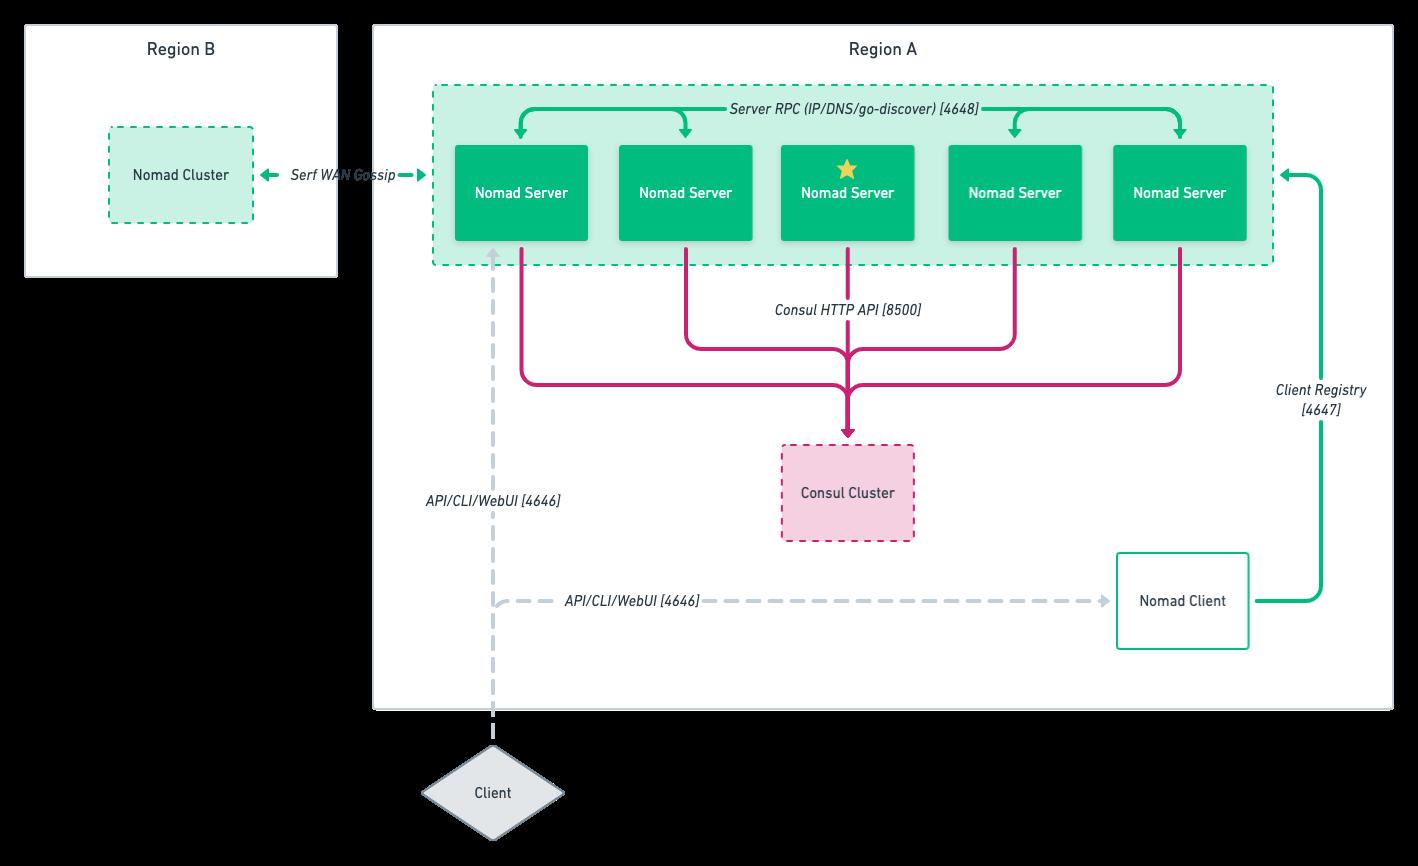 Nomad network diagram